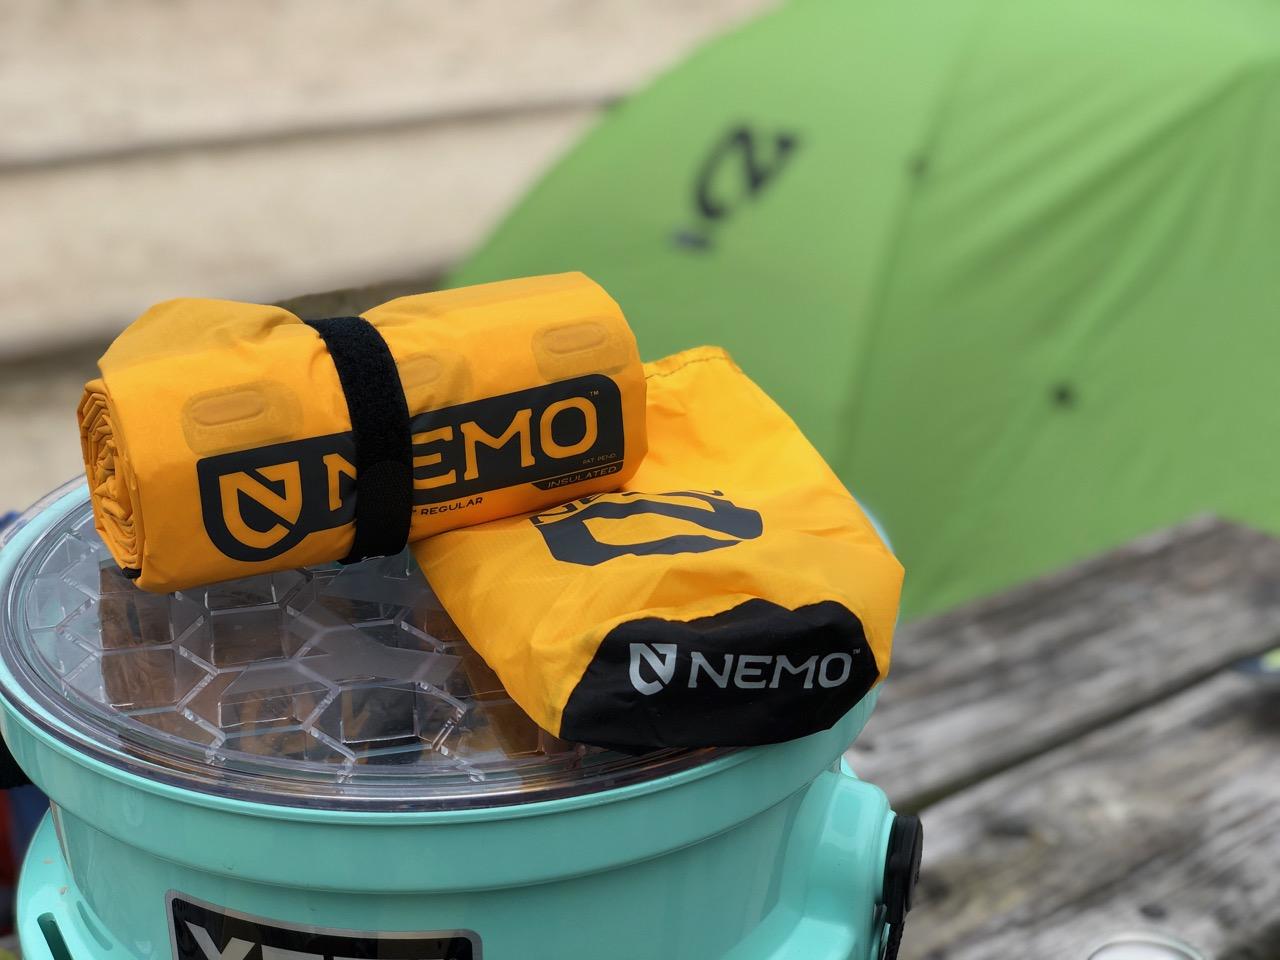 NEMO Tensor Regular Insulated Ultralight Sleeping Pad (2019) Unpacked On YETI Loadout Bucket